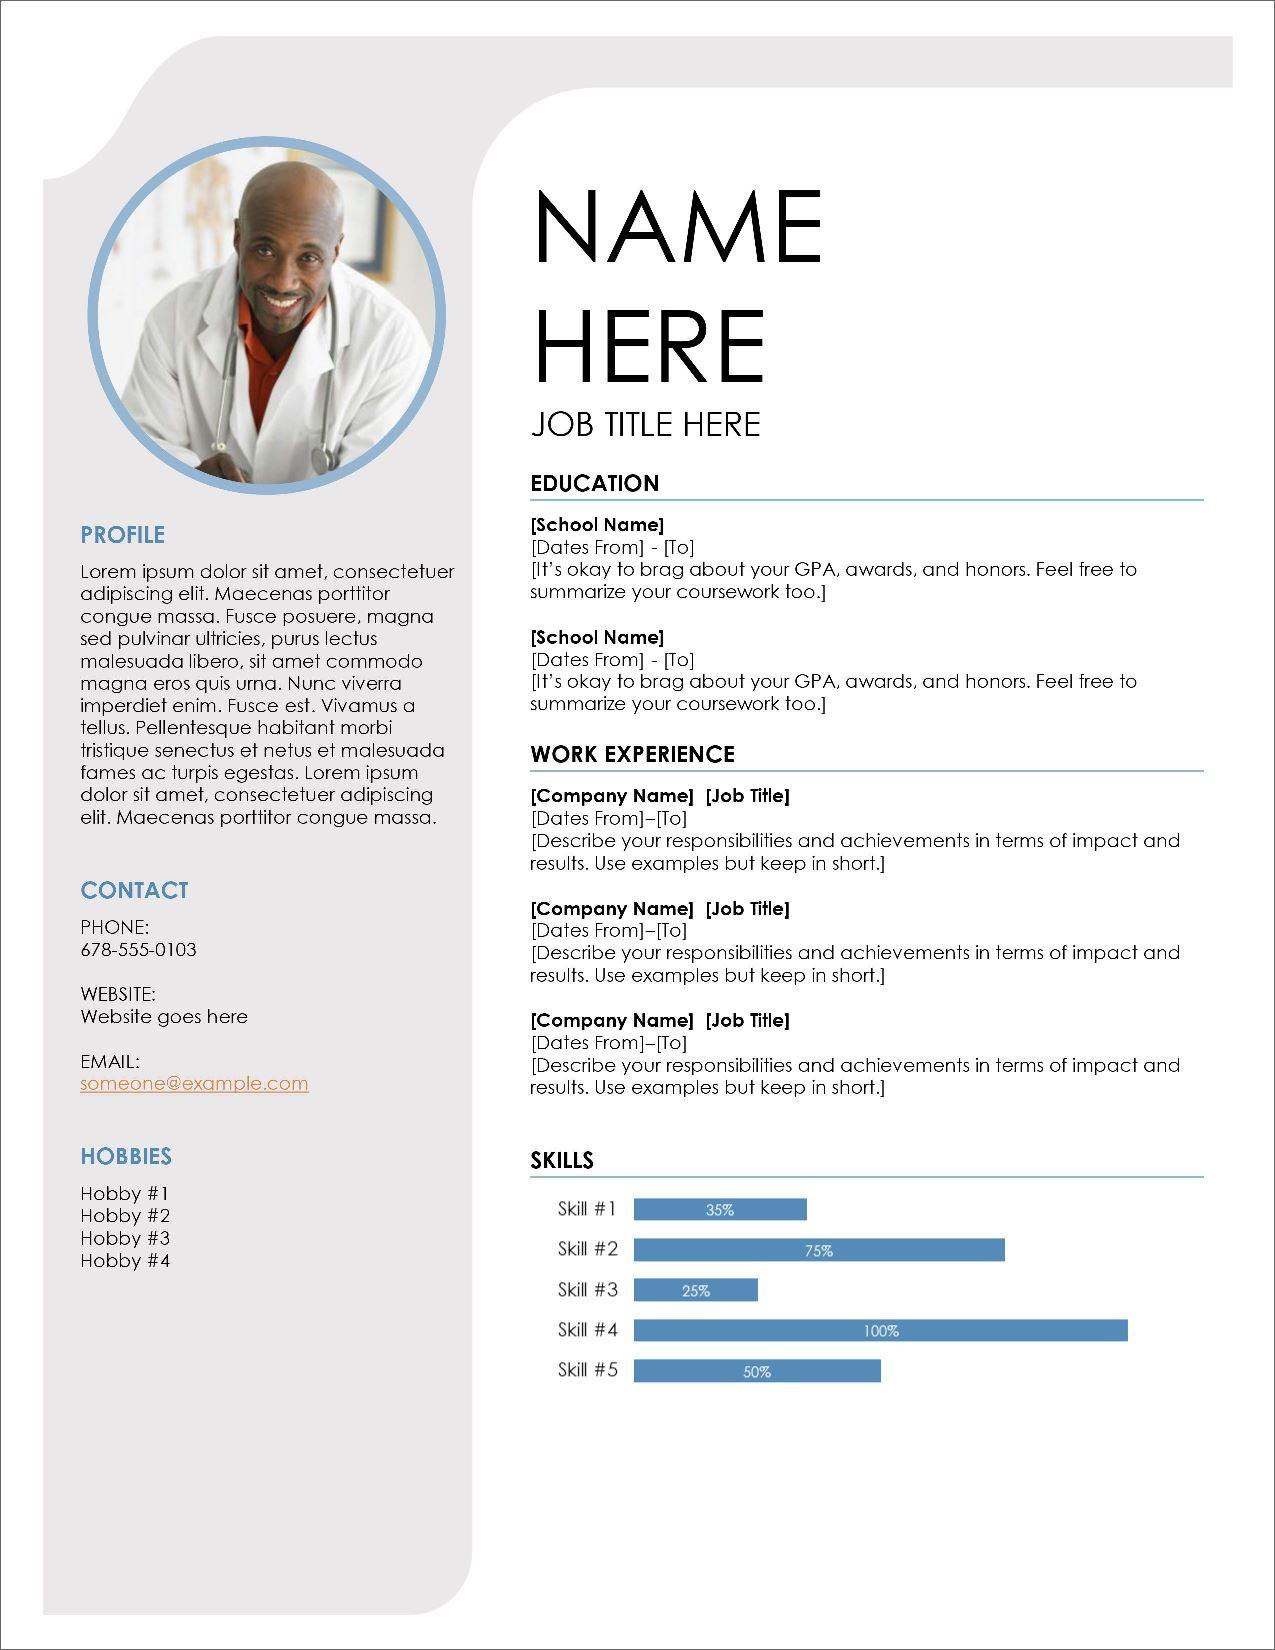 005 Rare Resume Template On Word Design  Free Download Australia Microsoft Office 2007 PhilippineFull